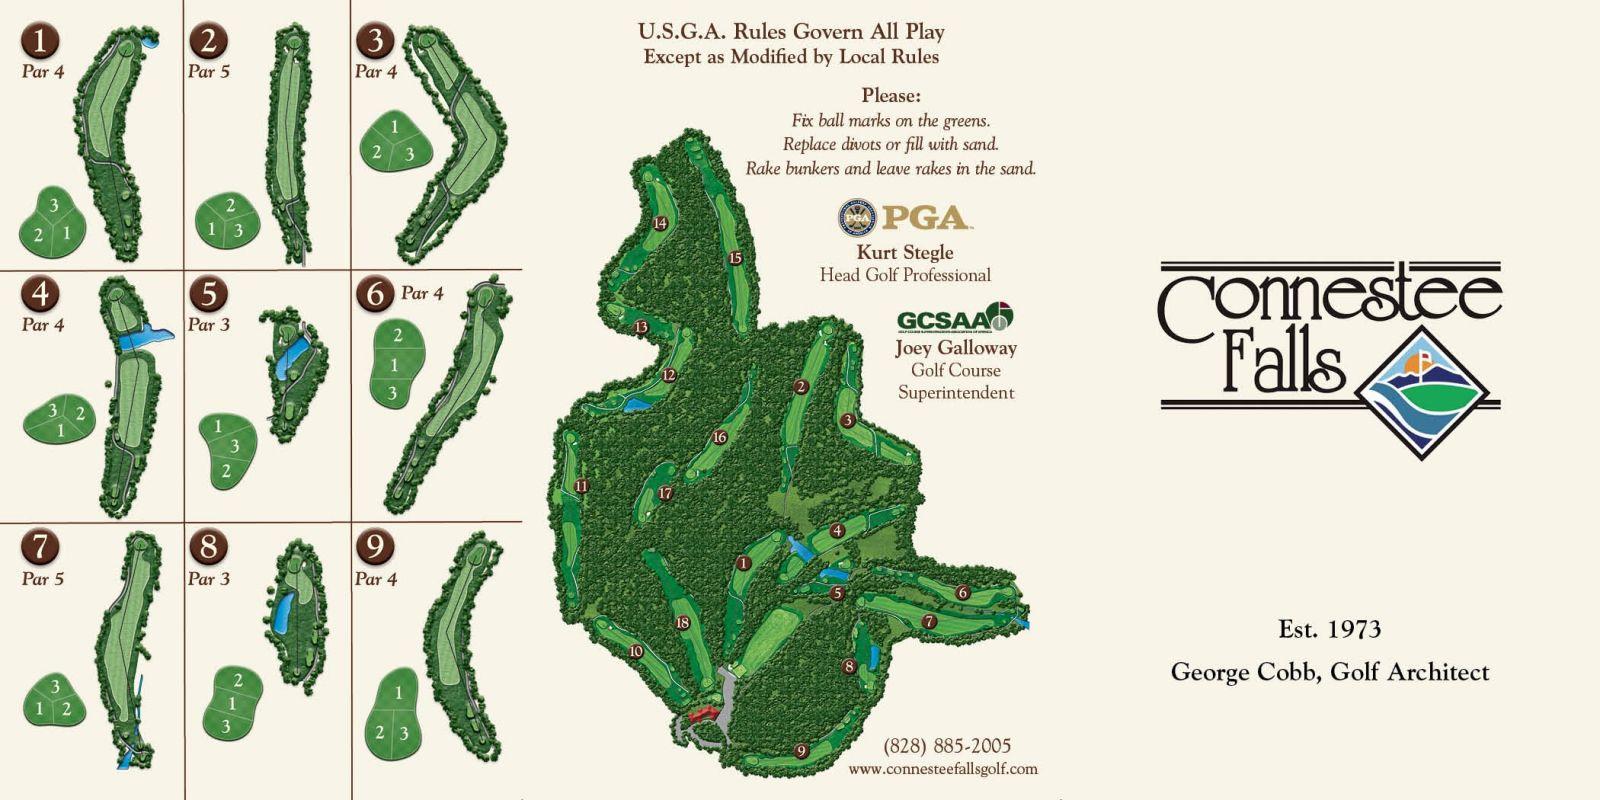 Brevard Golf Course Connestee Falls Golf Club